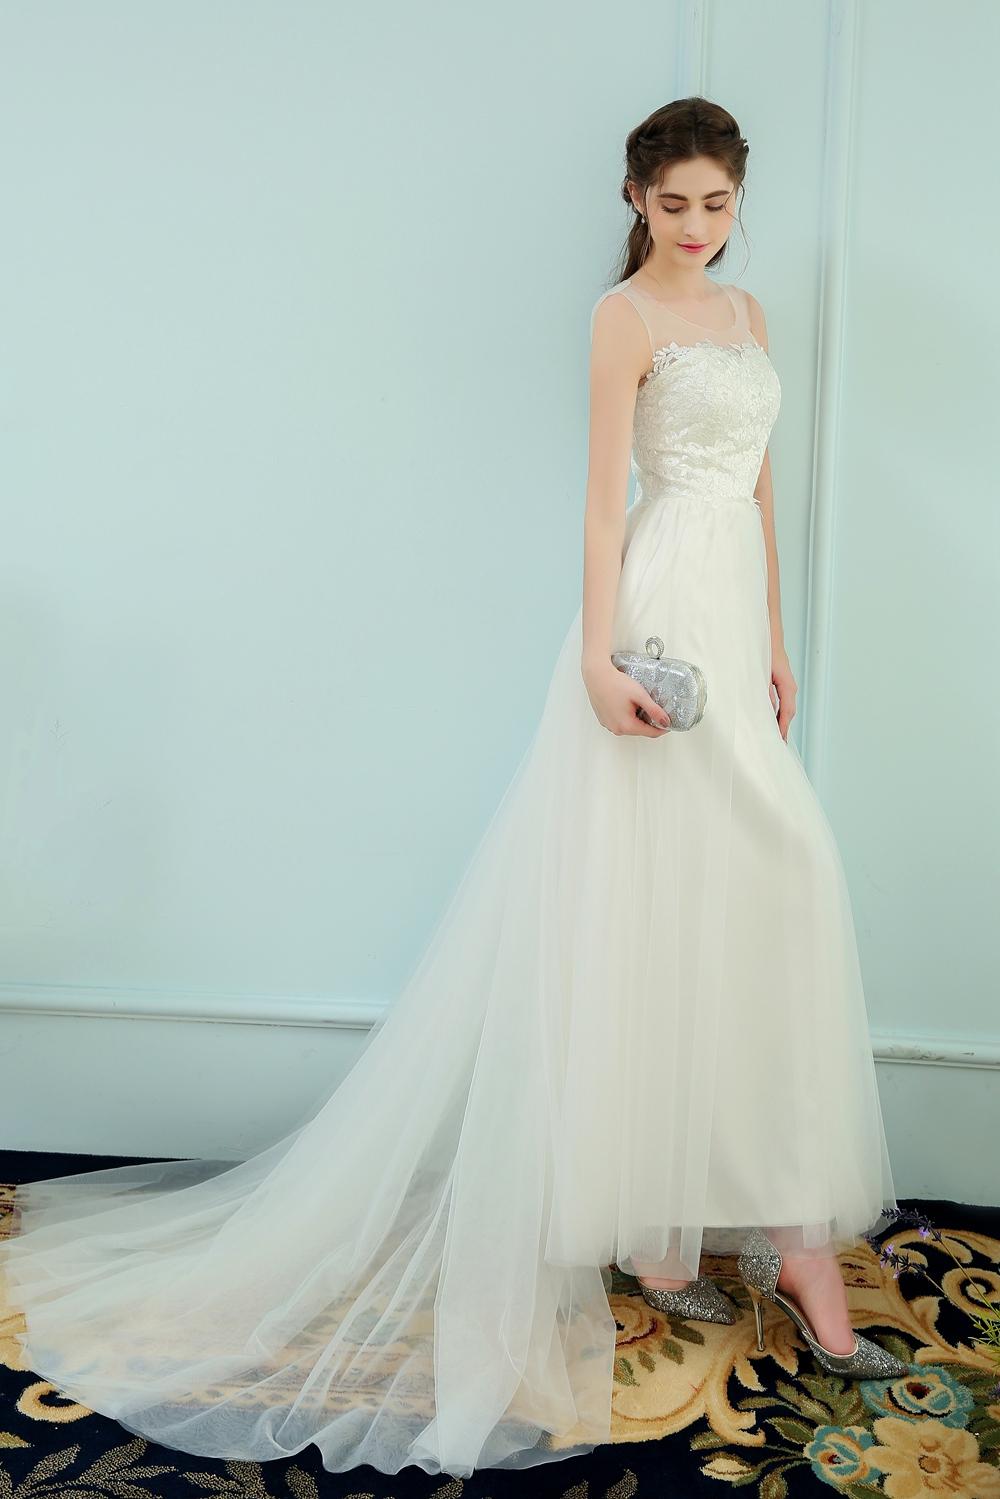 Luxury Vestidos De Novia Playeros Mold - All Wedding Dresses ...